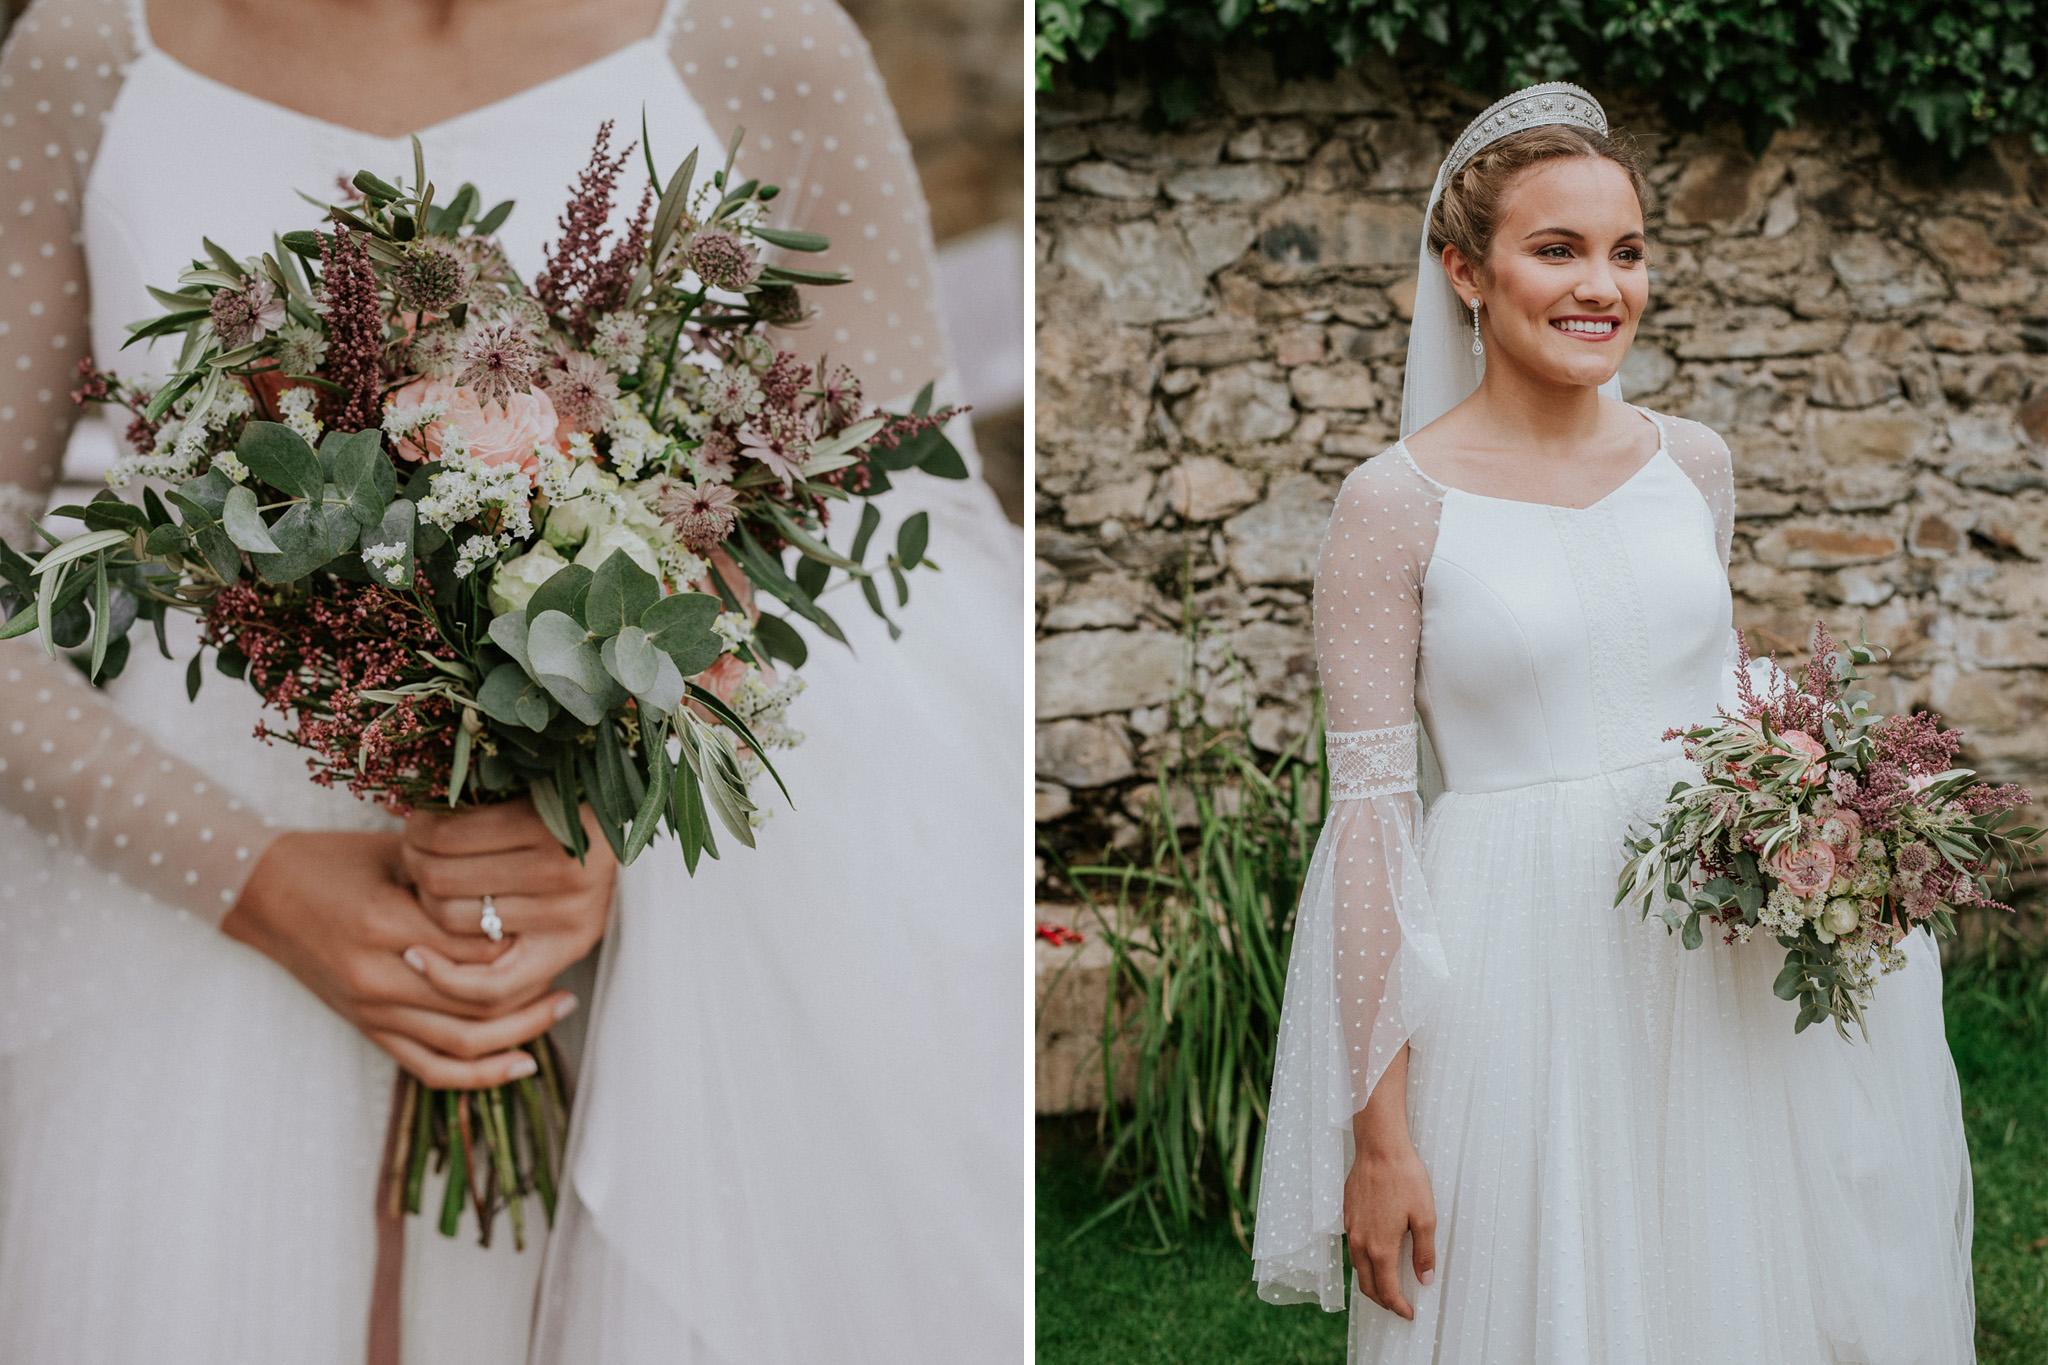 fotografia-boda-wedding-photographer-spain-concorazon-81